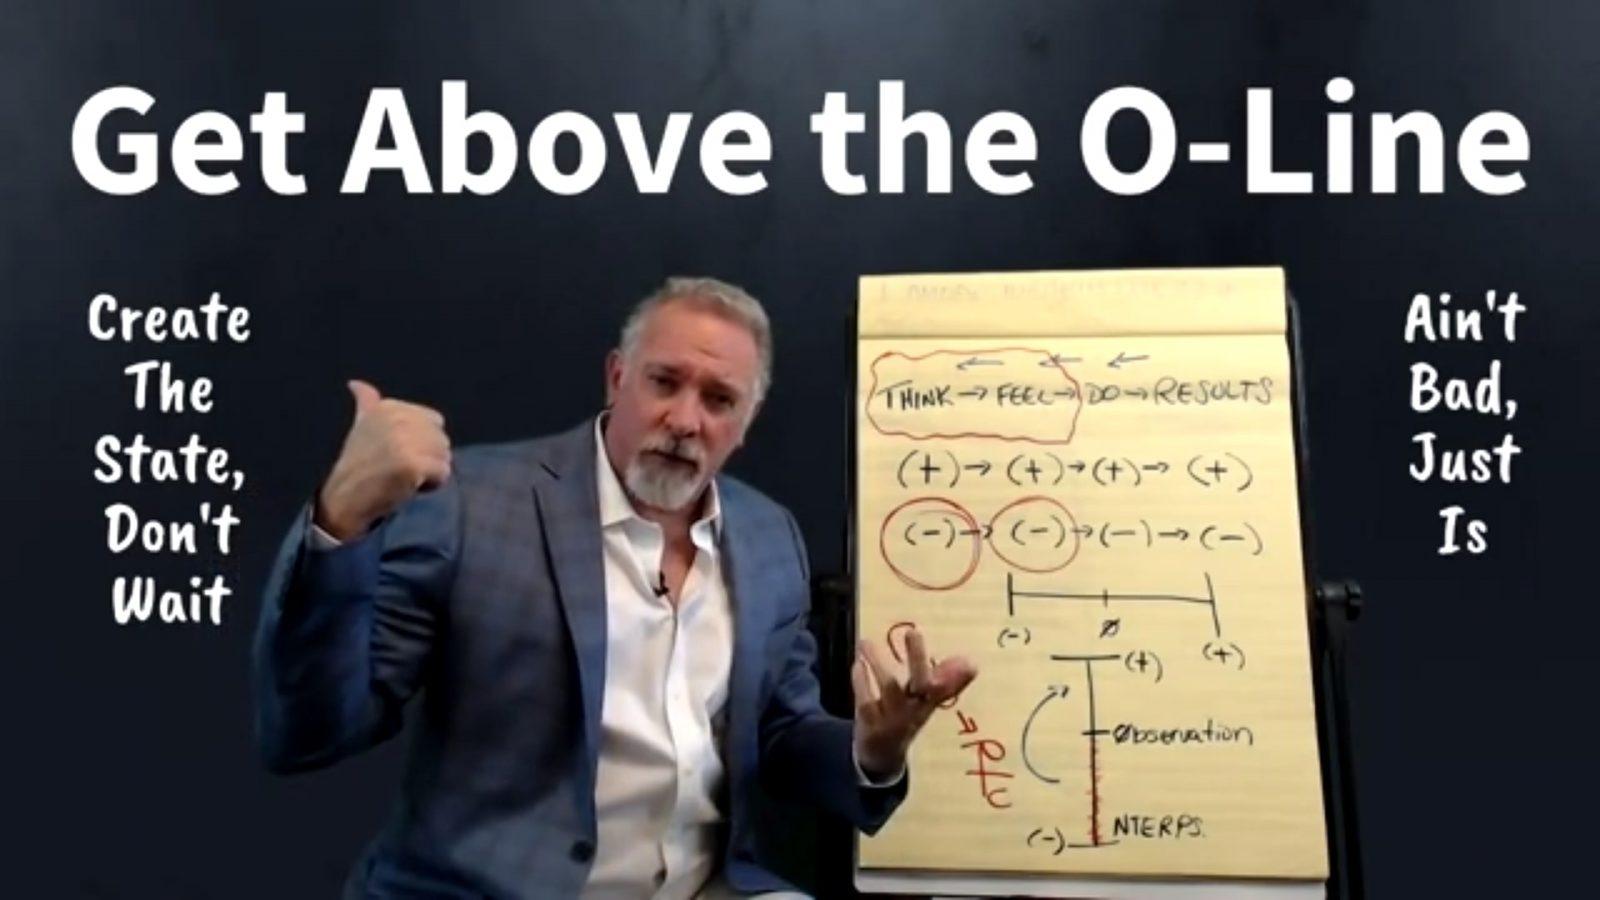 Get Above the O-Line 003